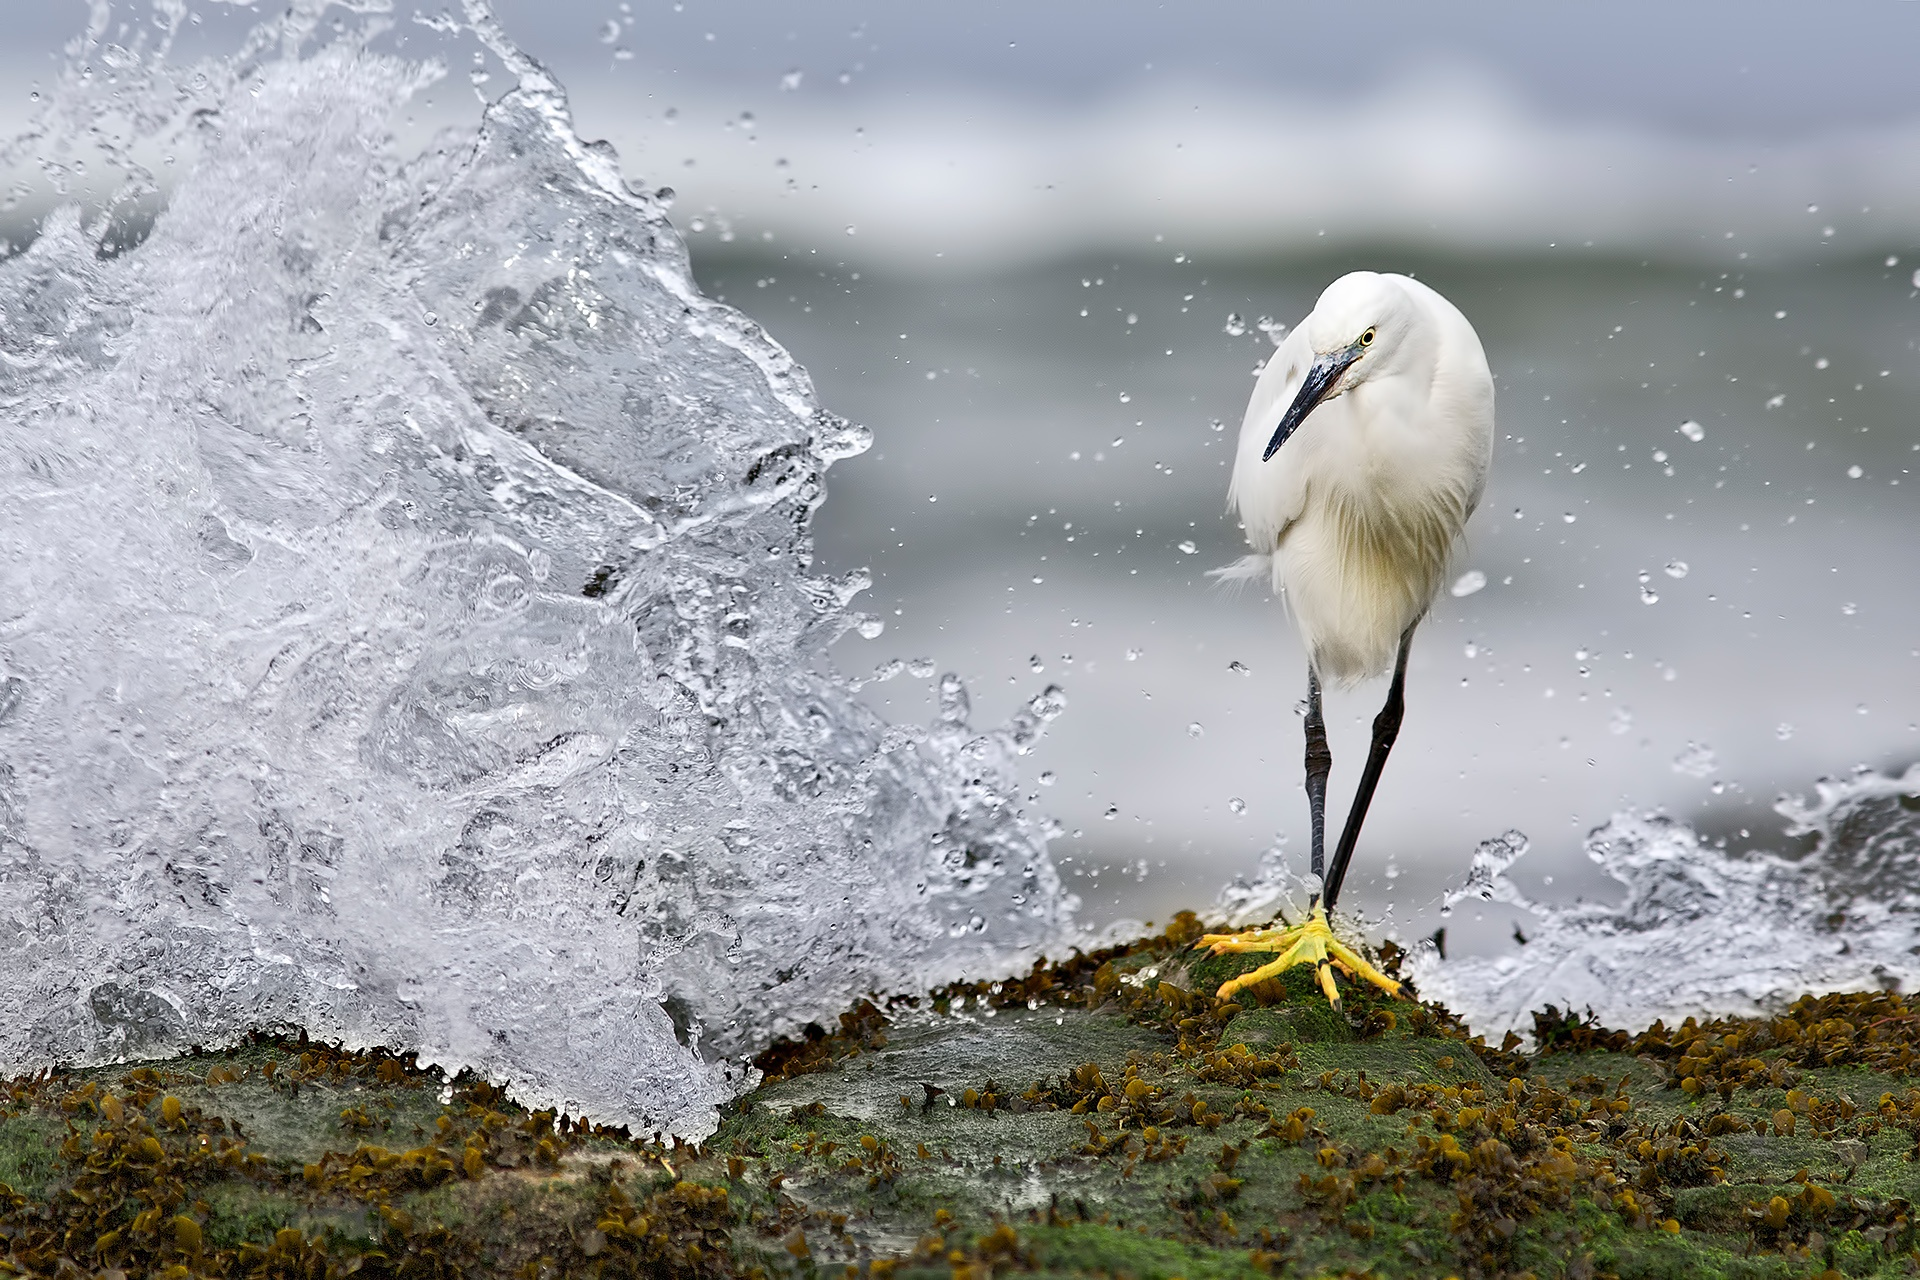 The Wave - Mario Suarez - Portfolio Natural, Fotografía de Naturaleza de Autor